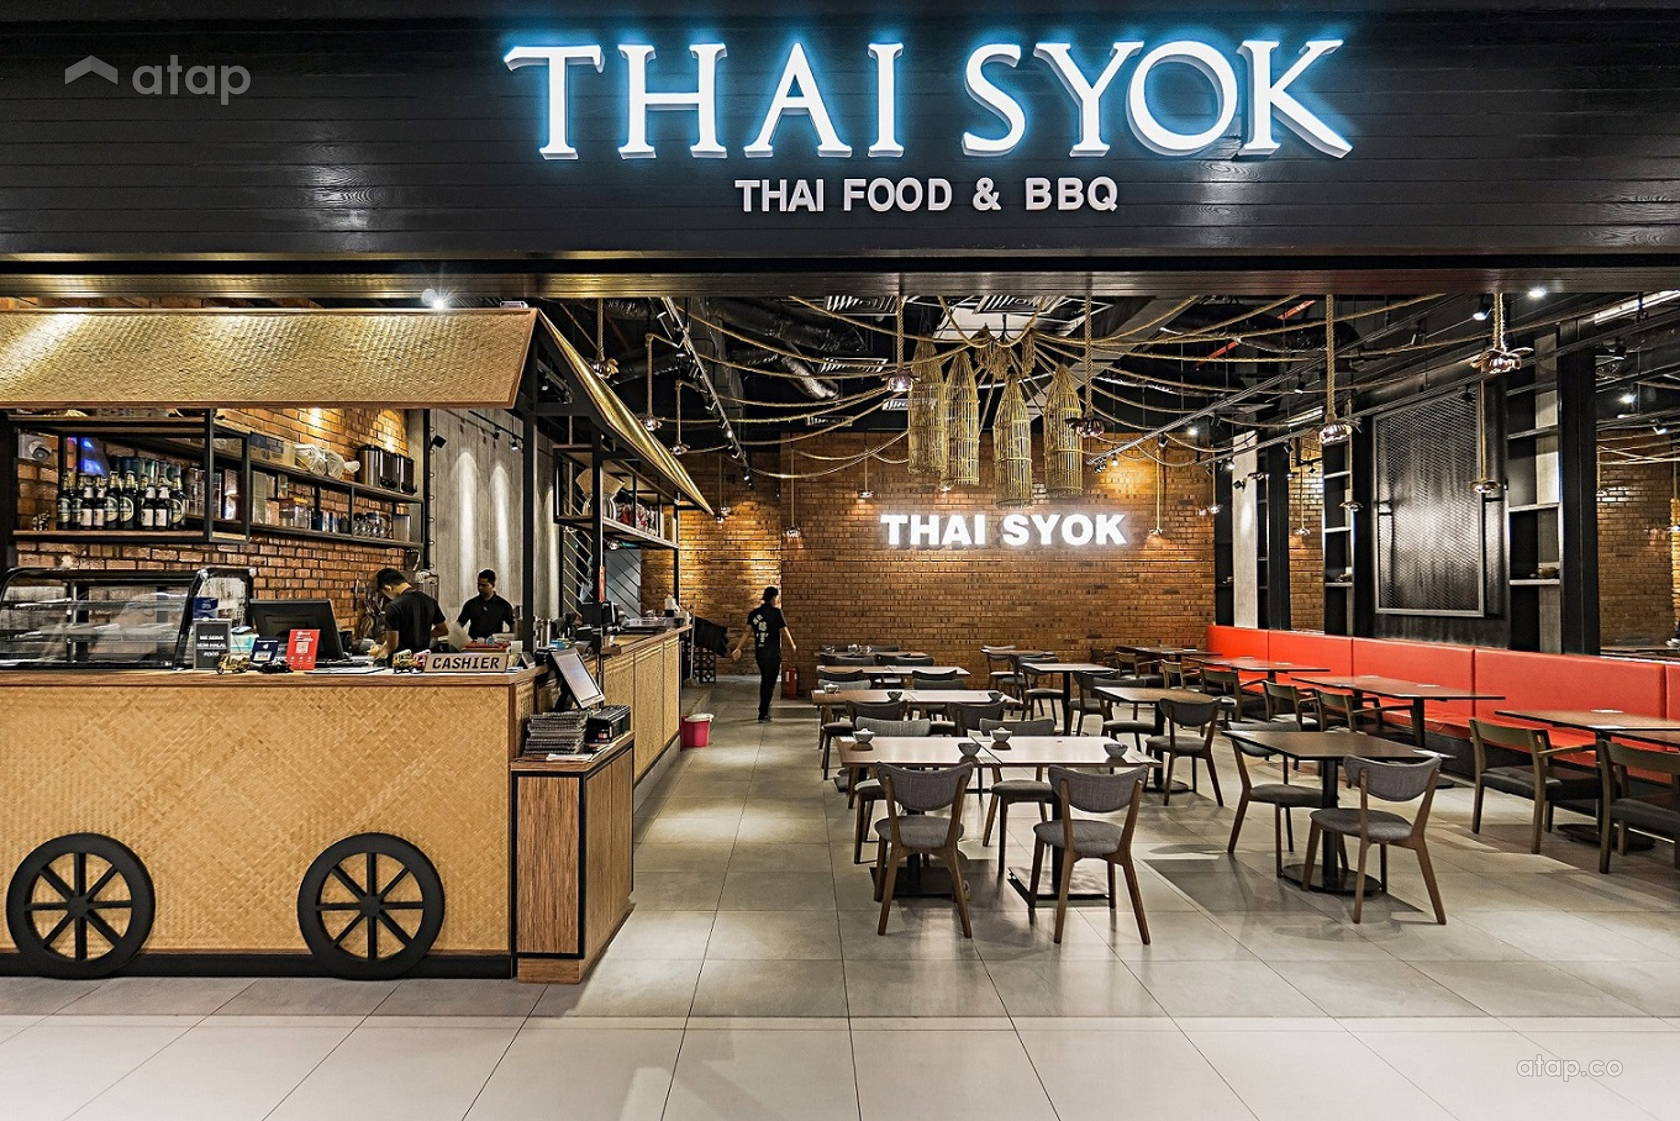 Thai Syok Central I City Mall Interior Design Renovation Ideas Photos And Price In Malaysia Atap Co